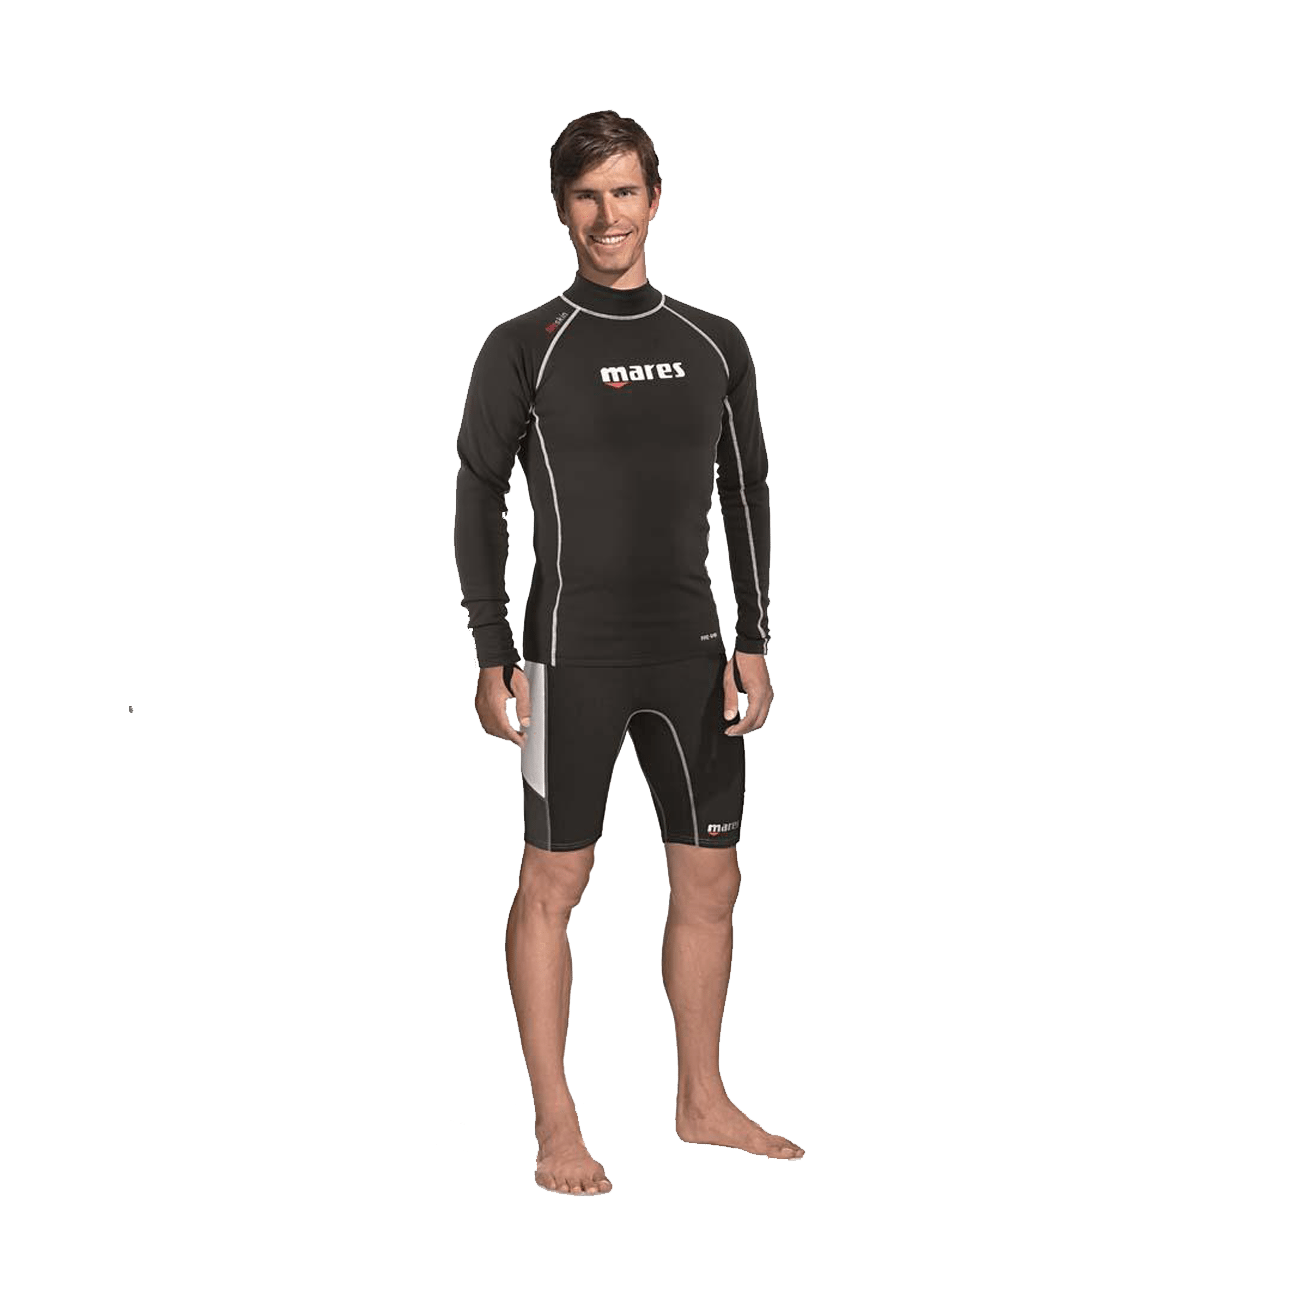 Mares Fire Skin Long Sleeve | Mares Rashguards | Mares Singapore